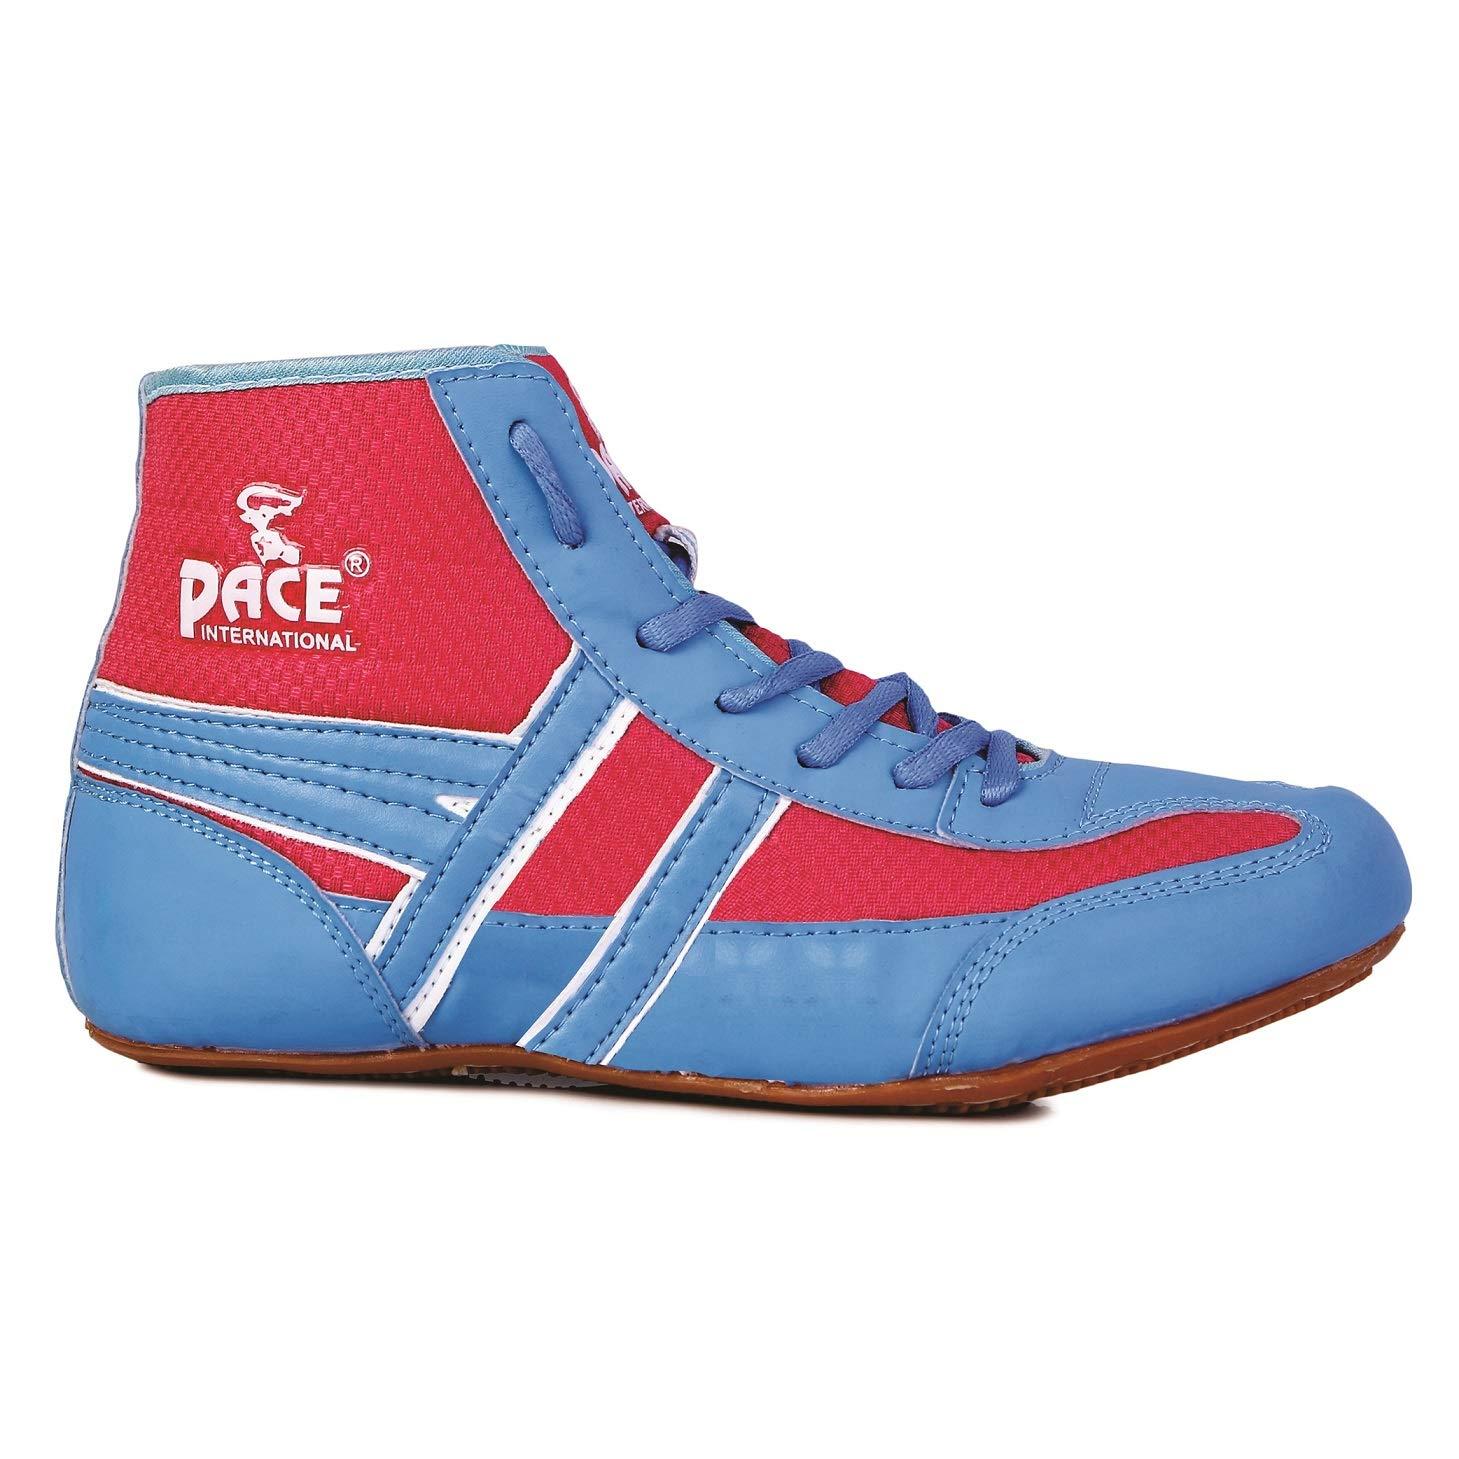 kabaddi mat shoes online off 61% -